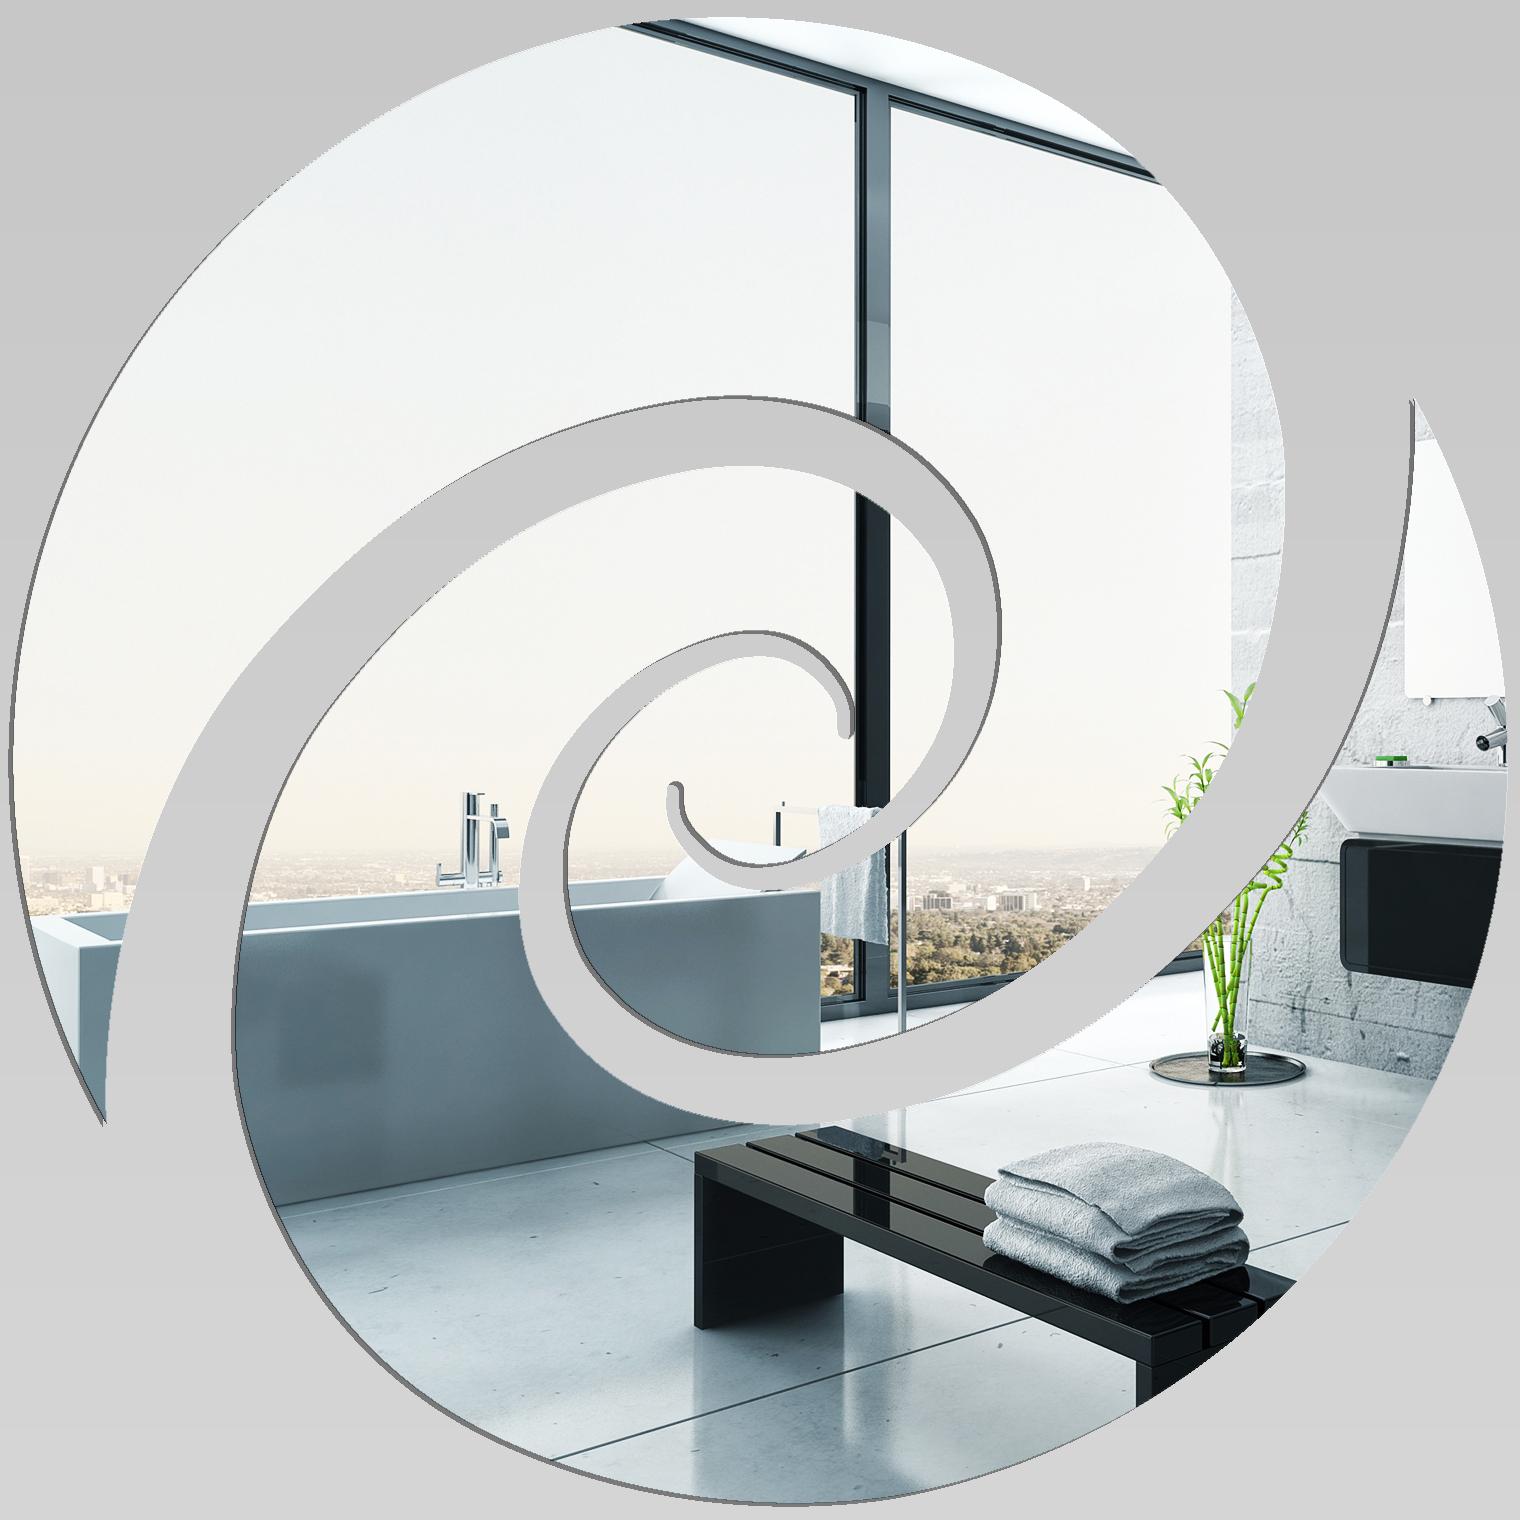 Miroir plexiglass acrylique spirale 7 pas cher for Miroir 70x70